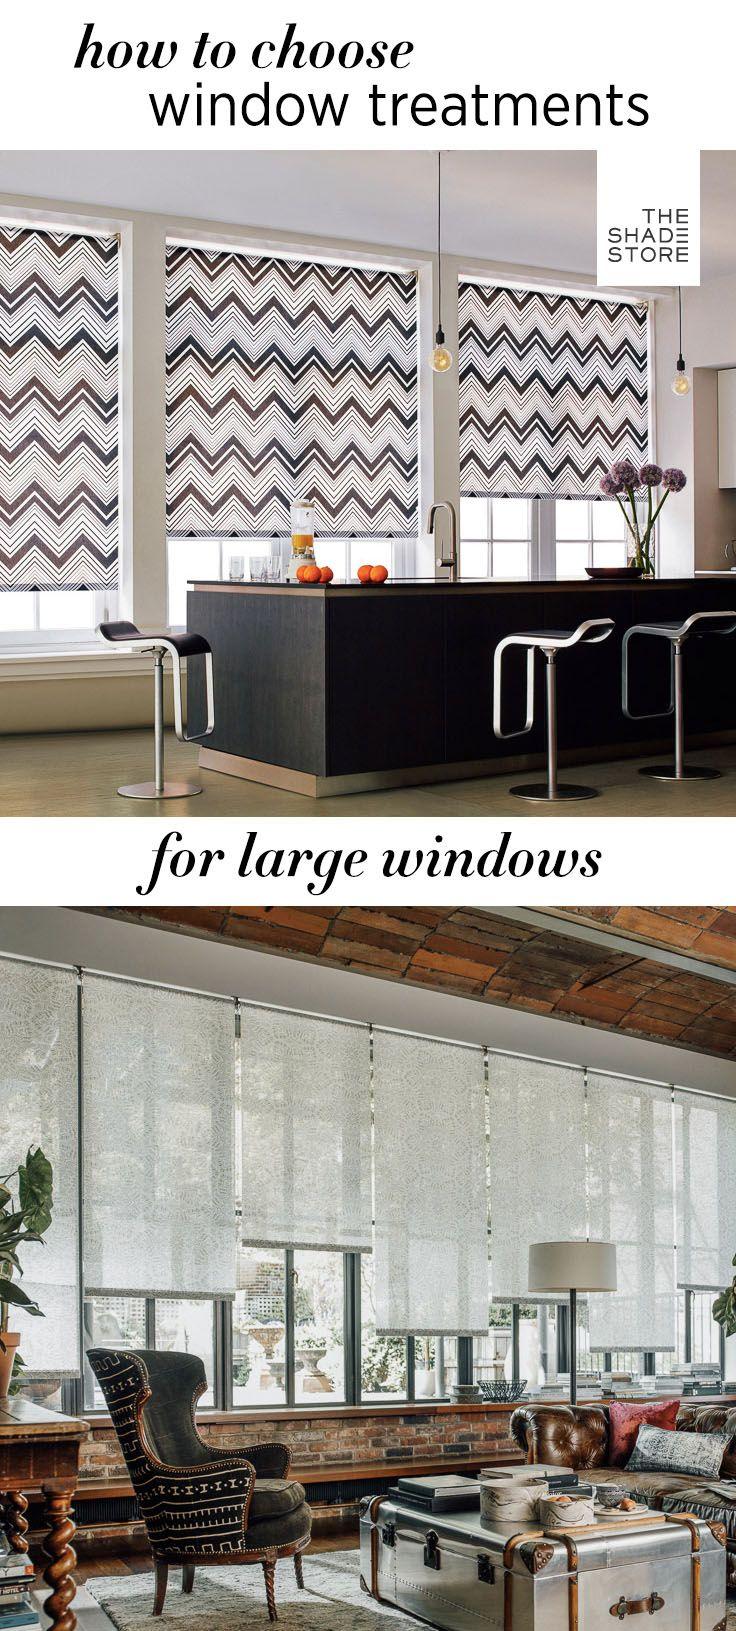 Window treatments for large windows solar shades solar and window